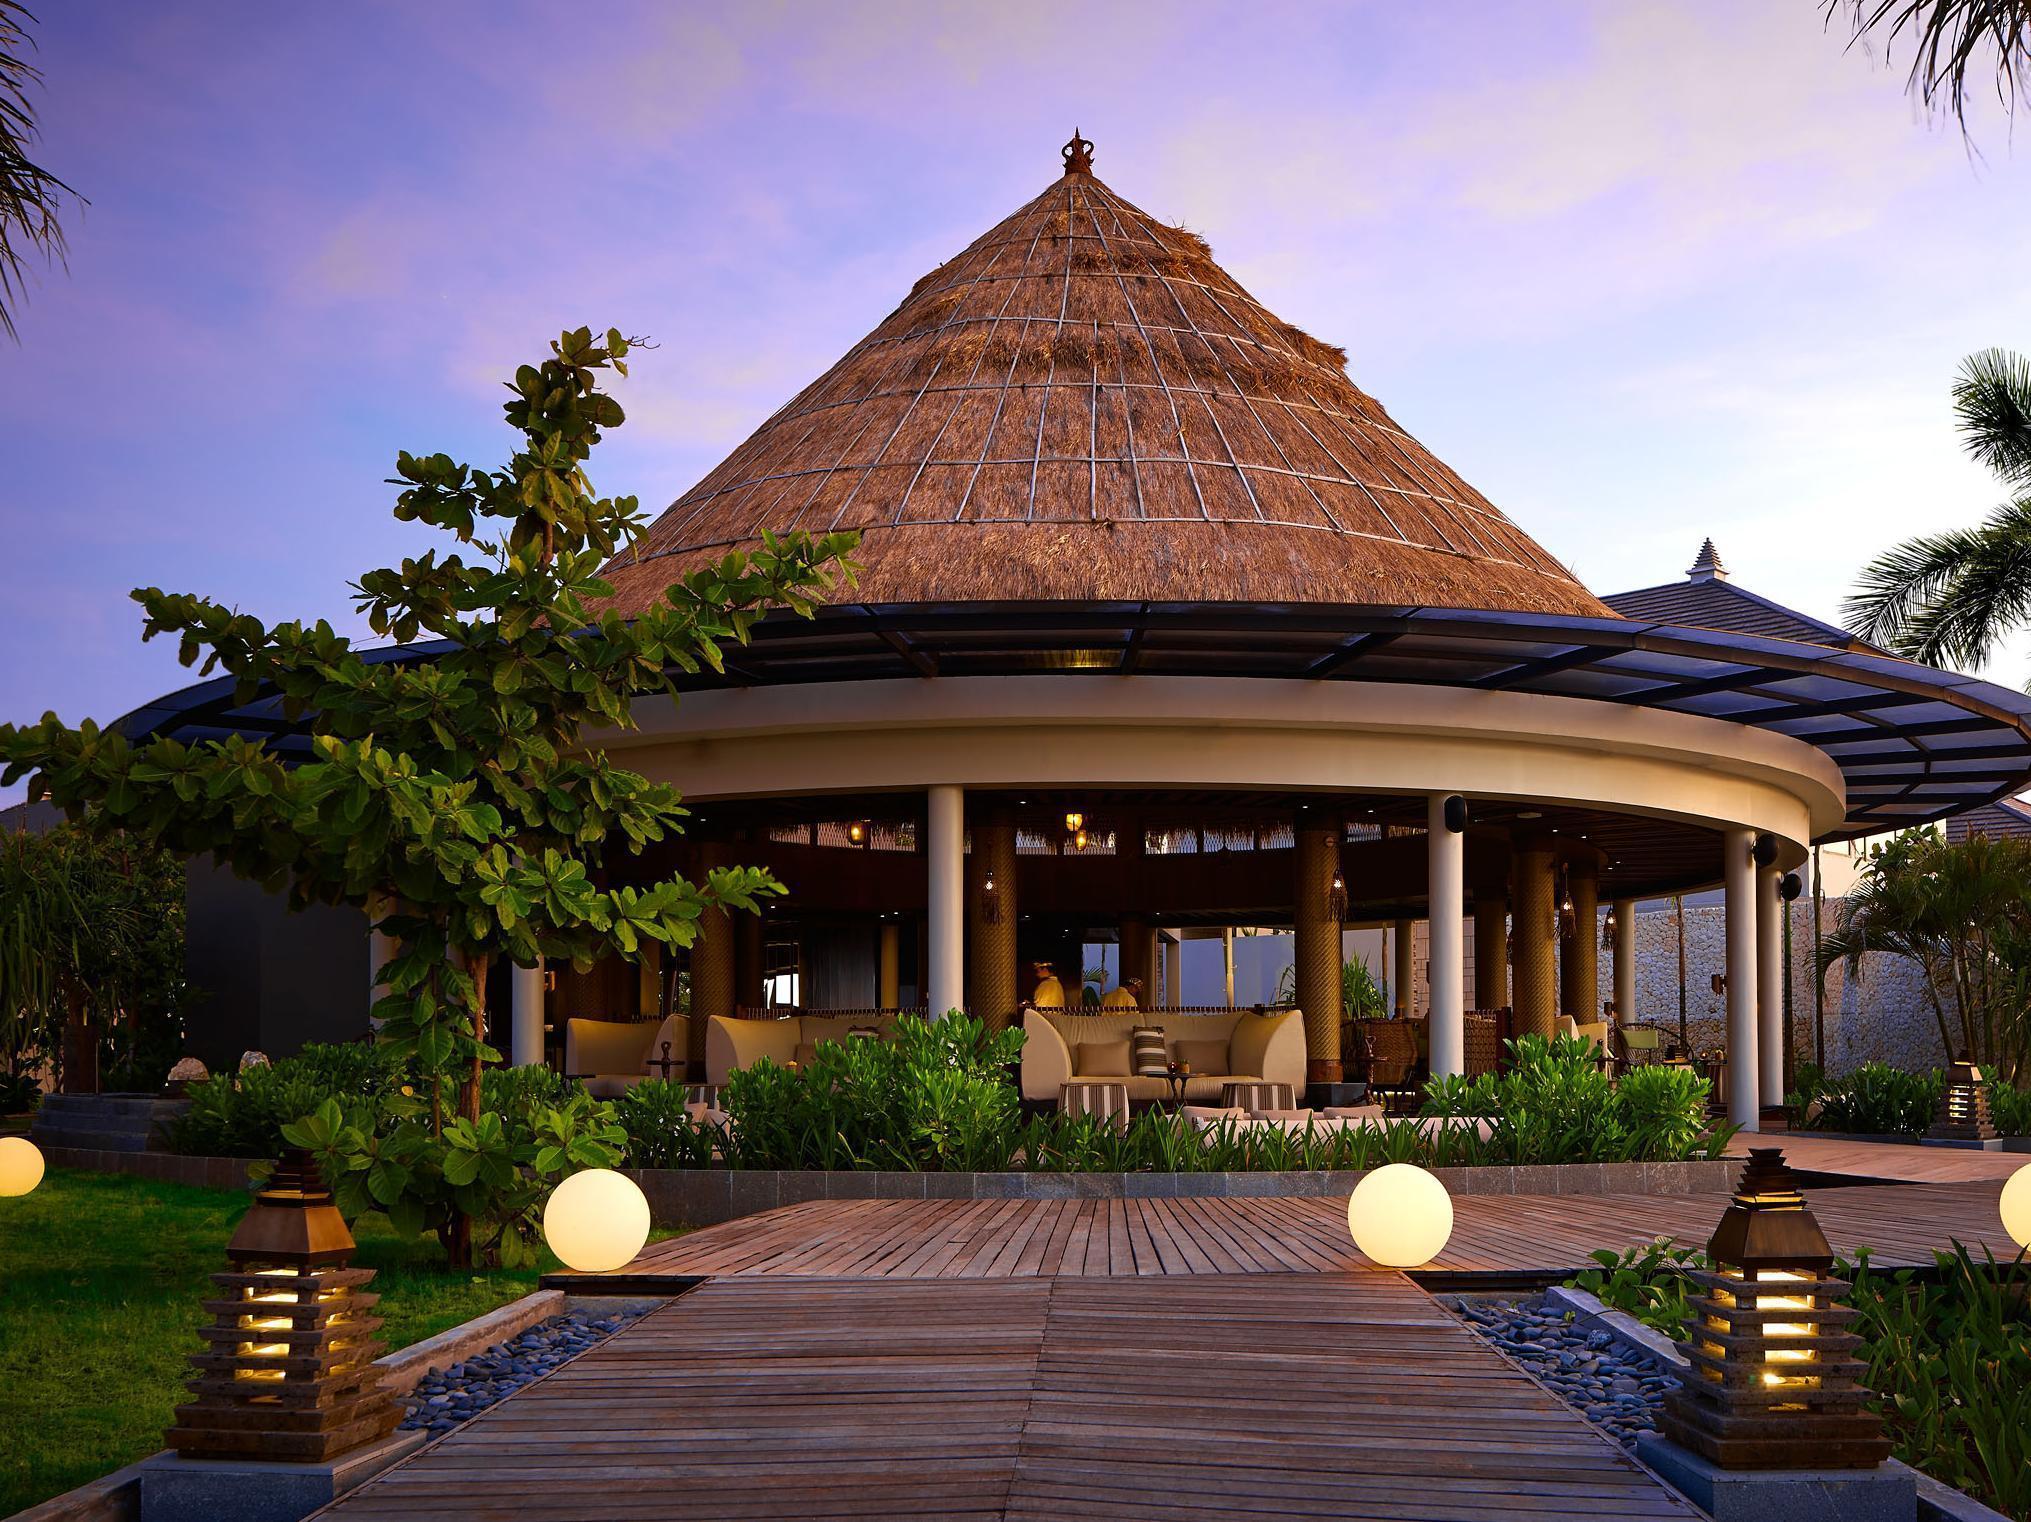 The Ritz-Carlton Bali20